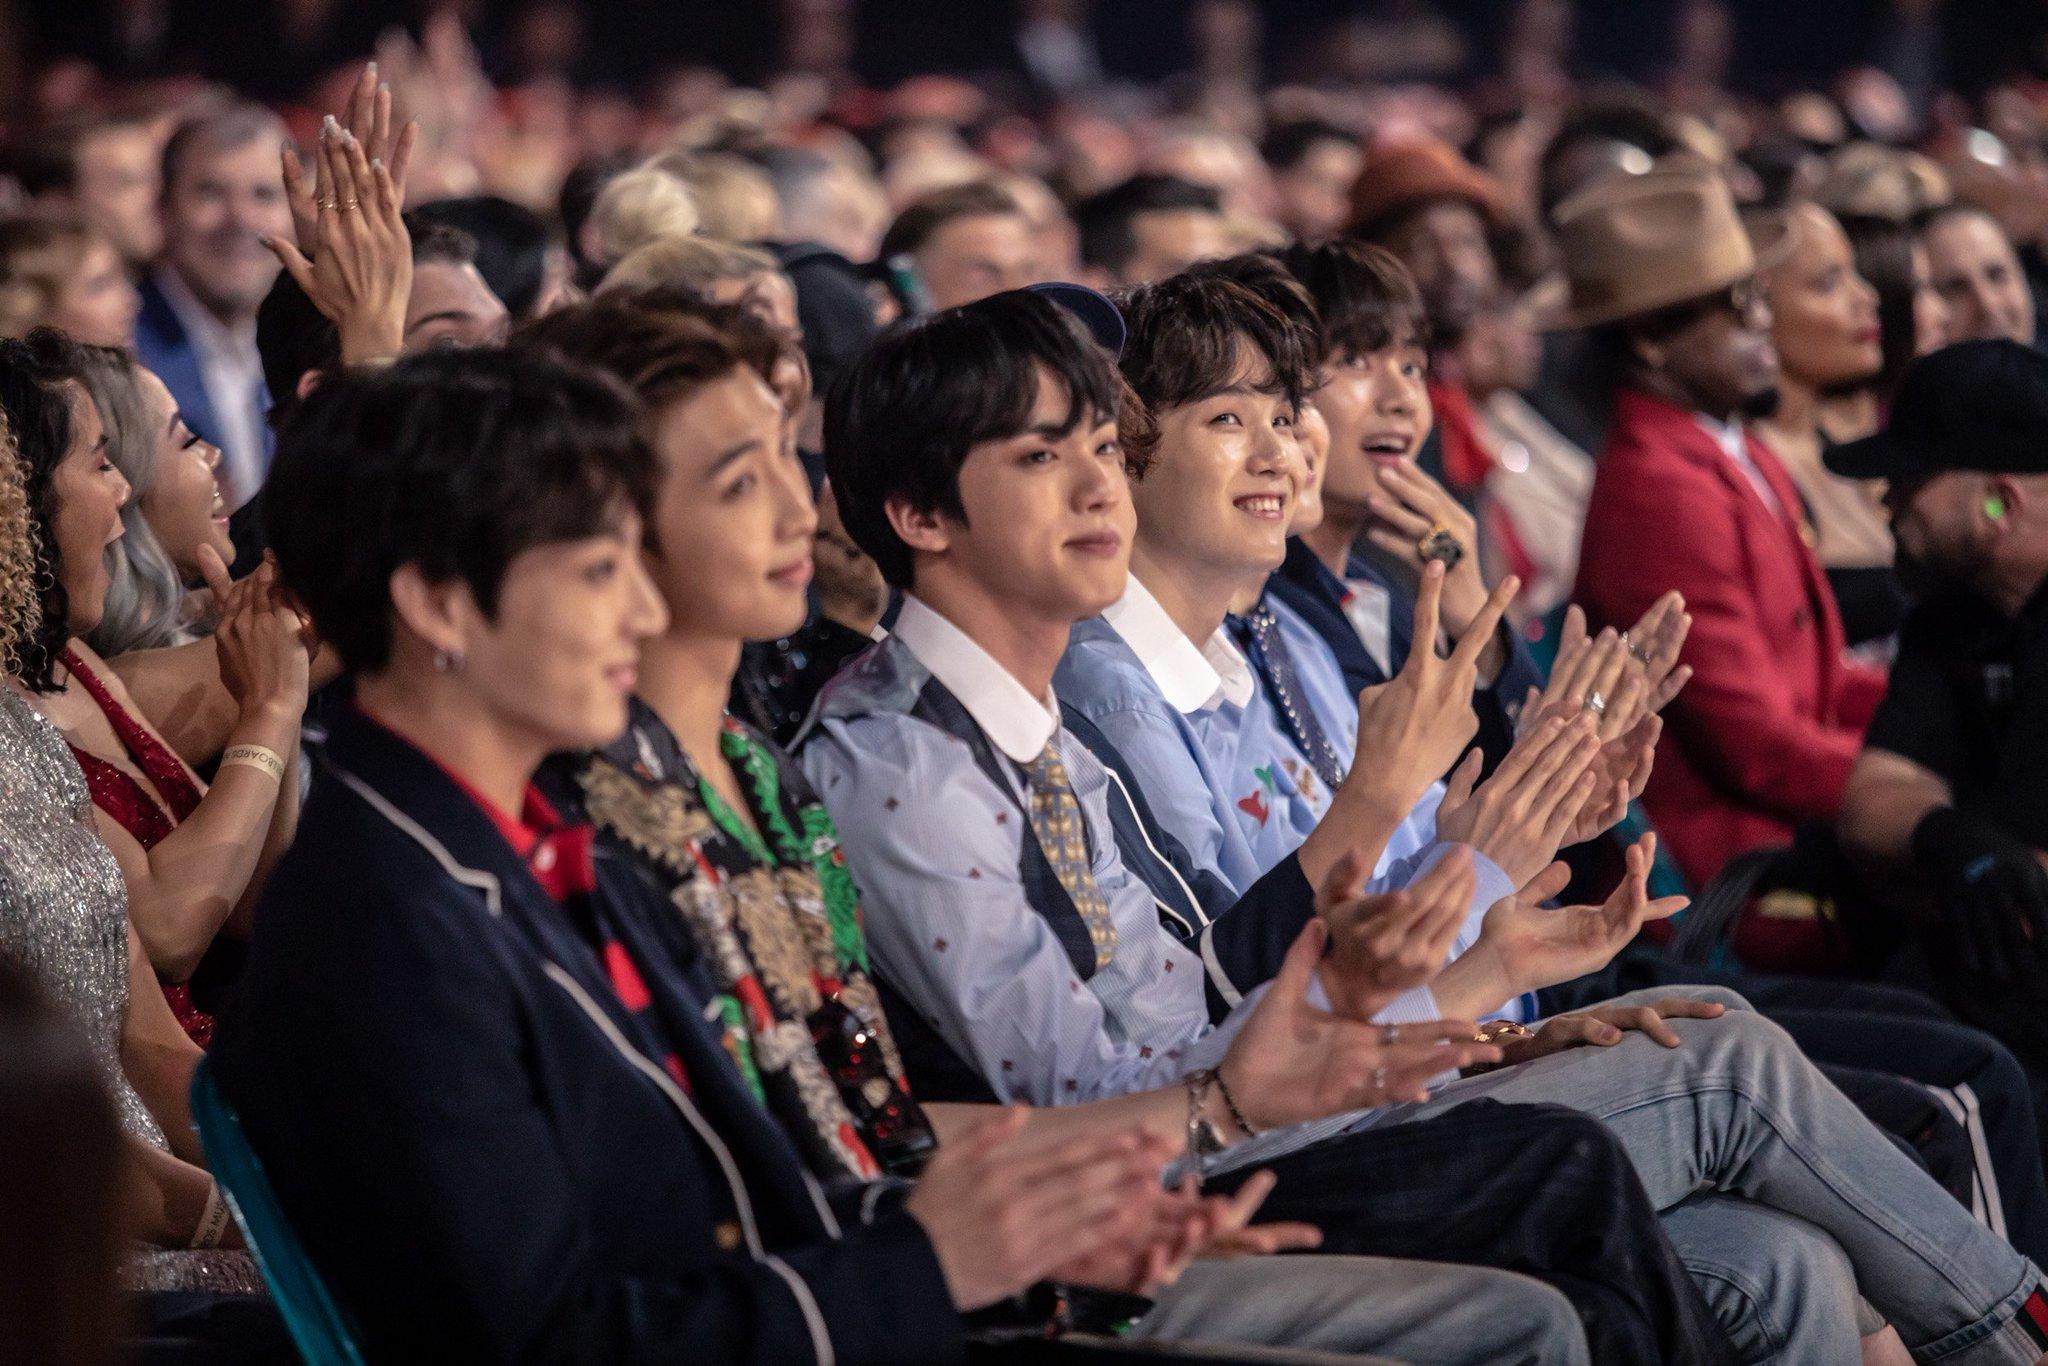 BTS enjoying the Billboard Music Awards (pics courtesy of DCP Social / DCP Digital) / @BTS_twt https://t.co/cthlNyHhmm